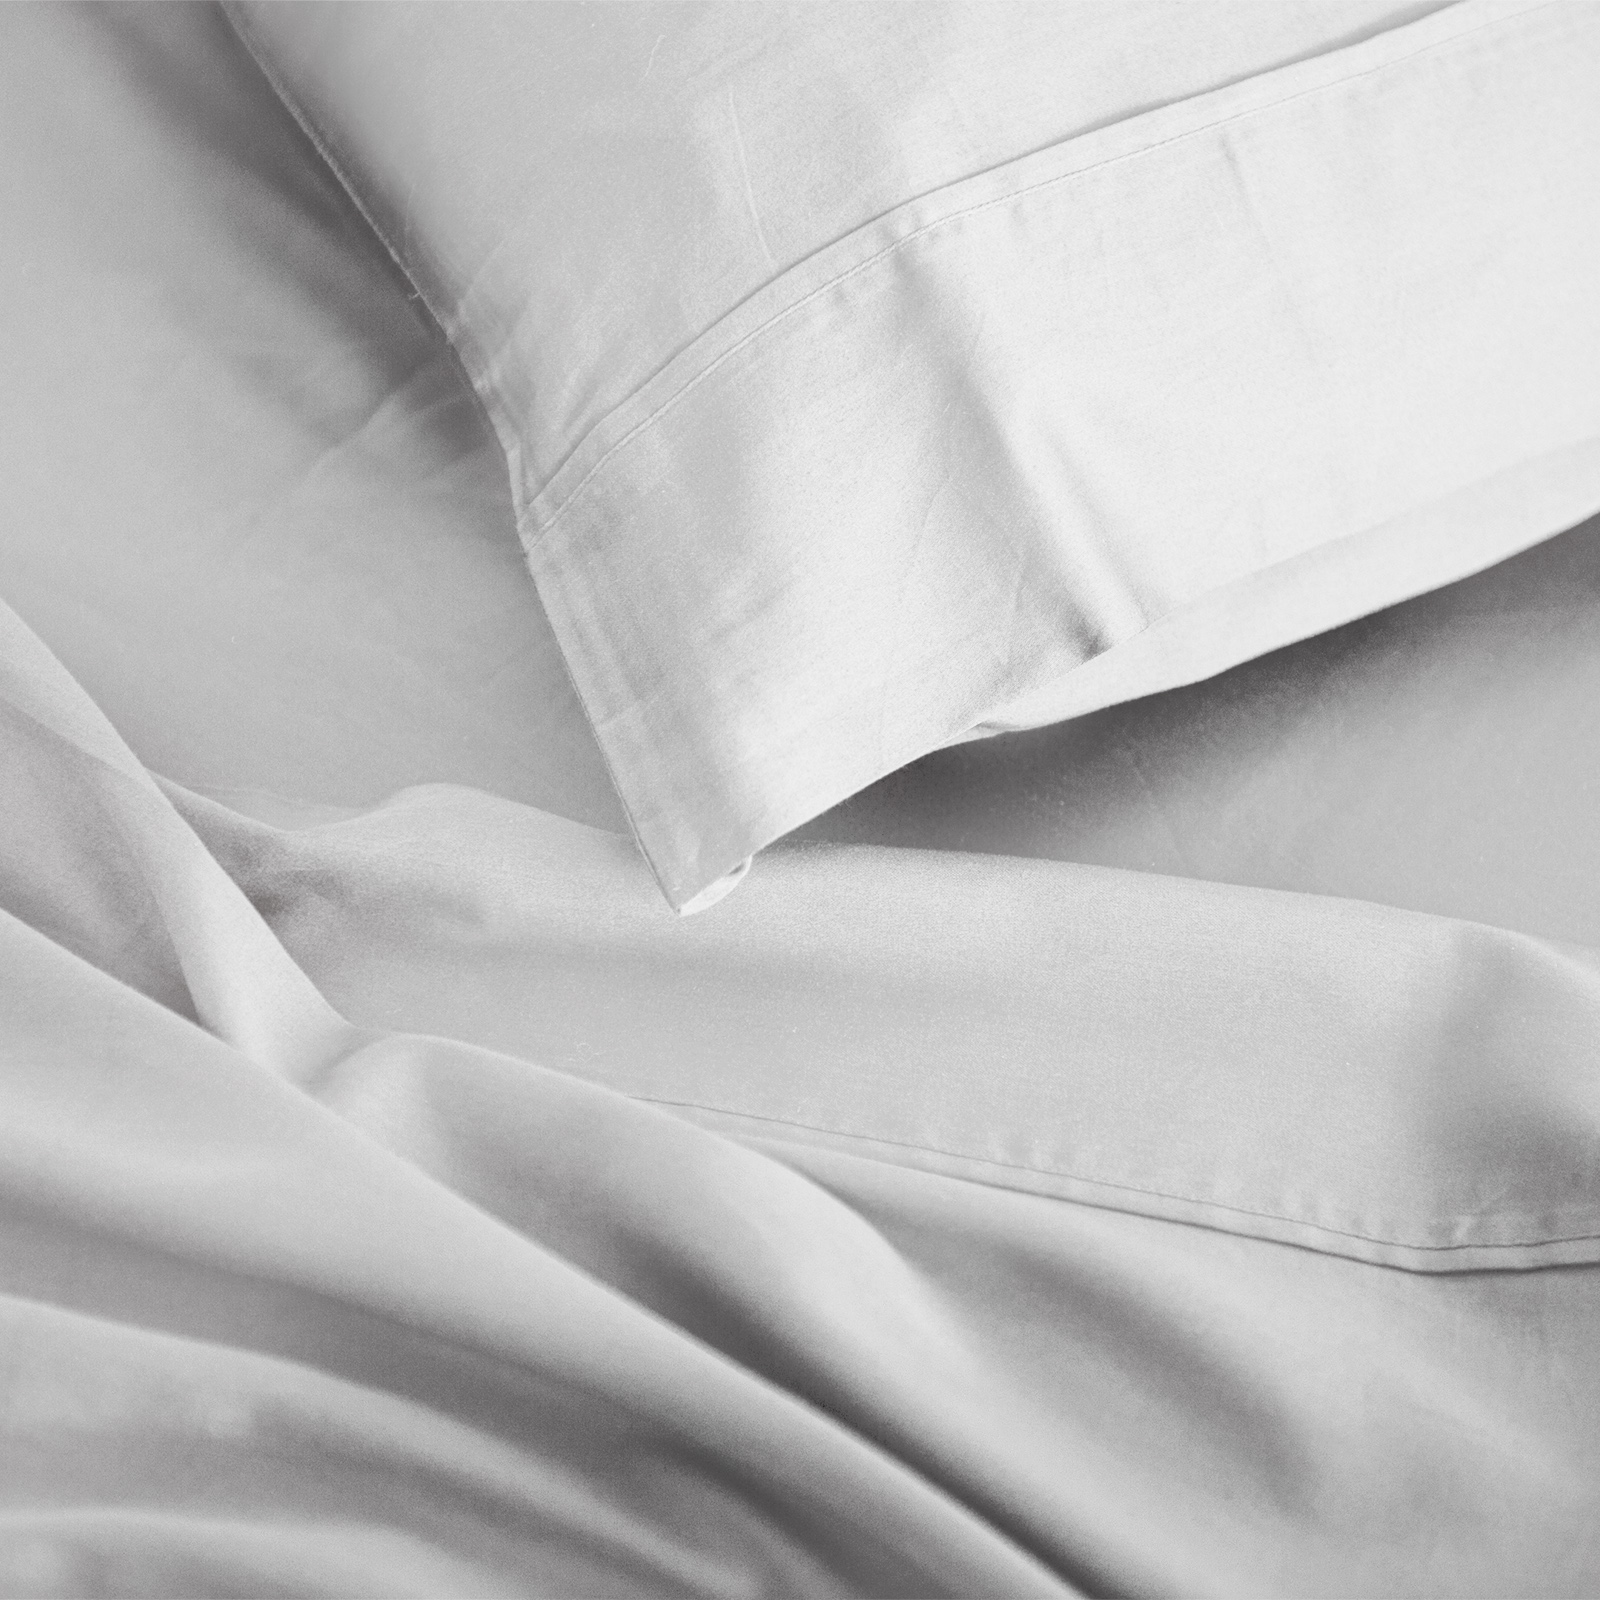 thumbnail 78 - Royal Comfort 1000TC Hotel Grade Bamboo Cotton Sheets Pillowcases Set Ultrasoft